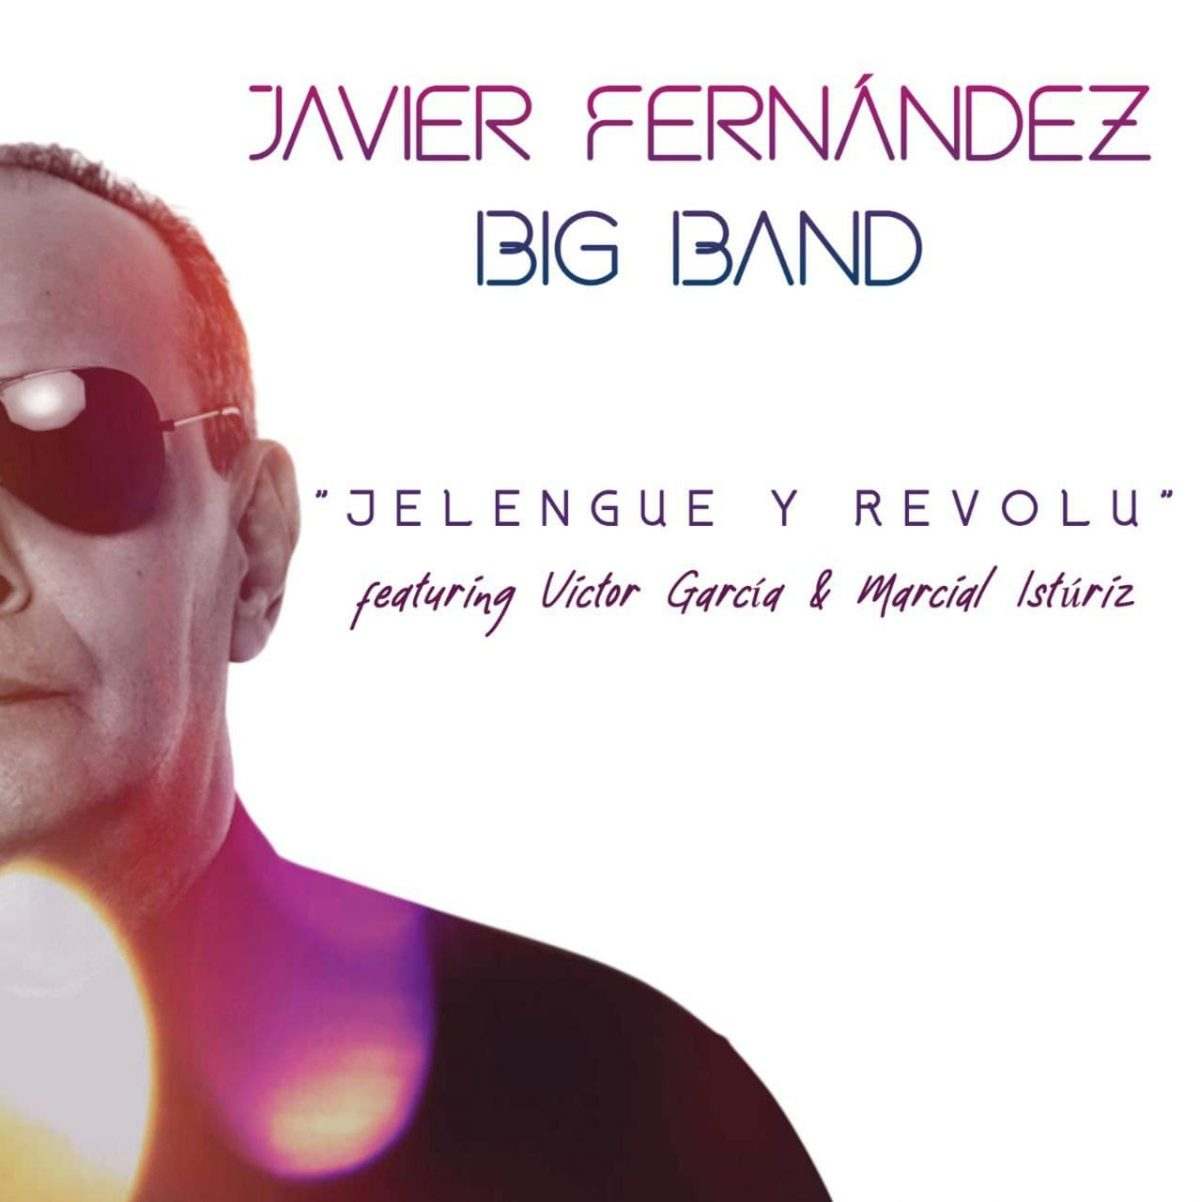 """JELENGUE Y REVOLÚ"" -JAVIER FERNÁNDEZ BIG BAND – featuring VÍCTOR GARCÍA & MARCIAL ISTÚRIZ"